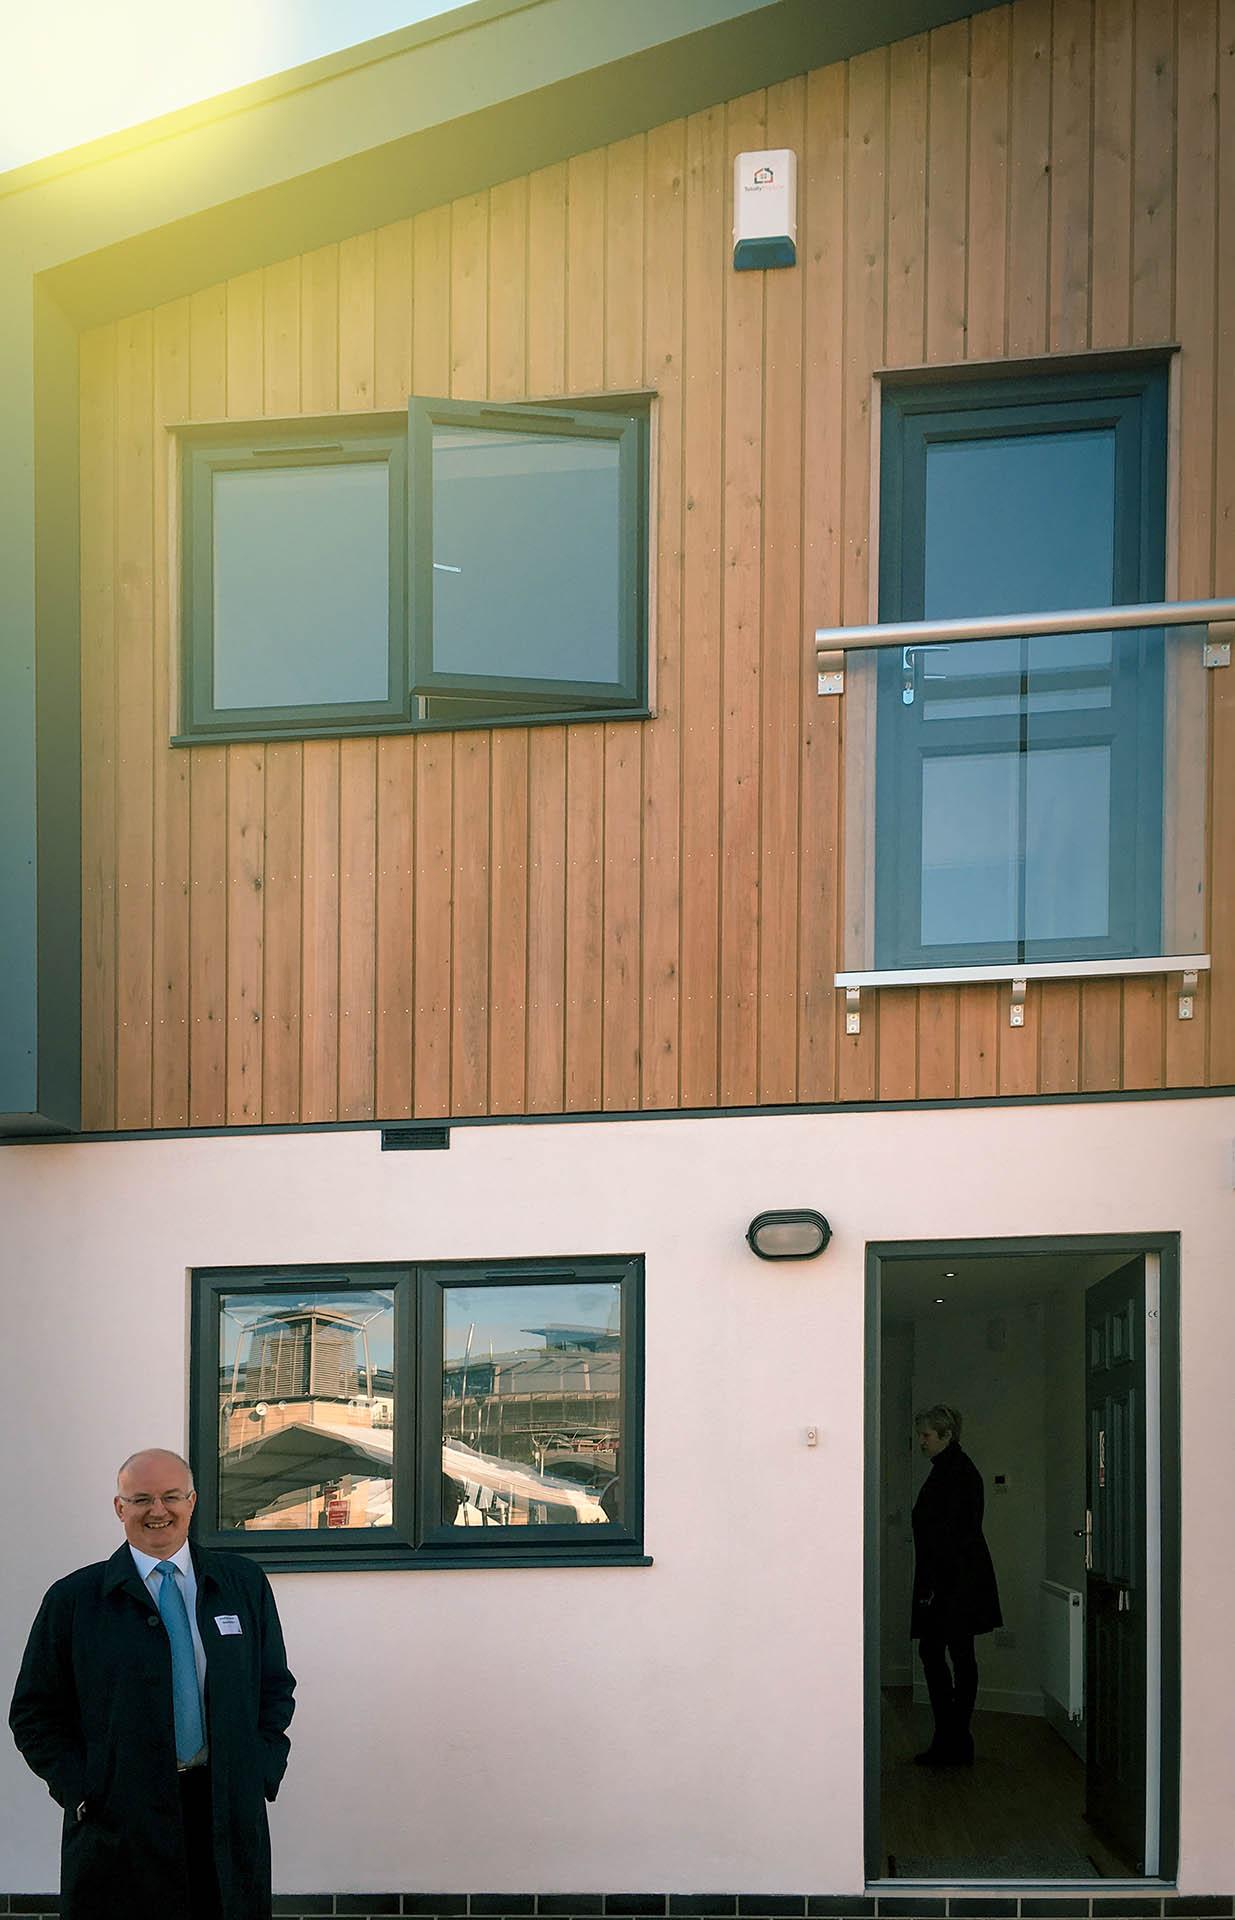 Bevan Brittan at the Bristol Housing Festival